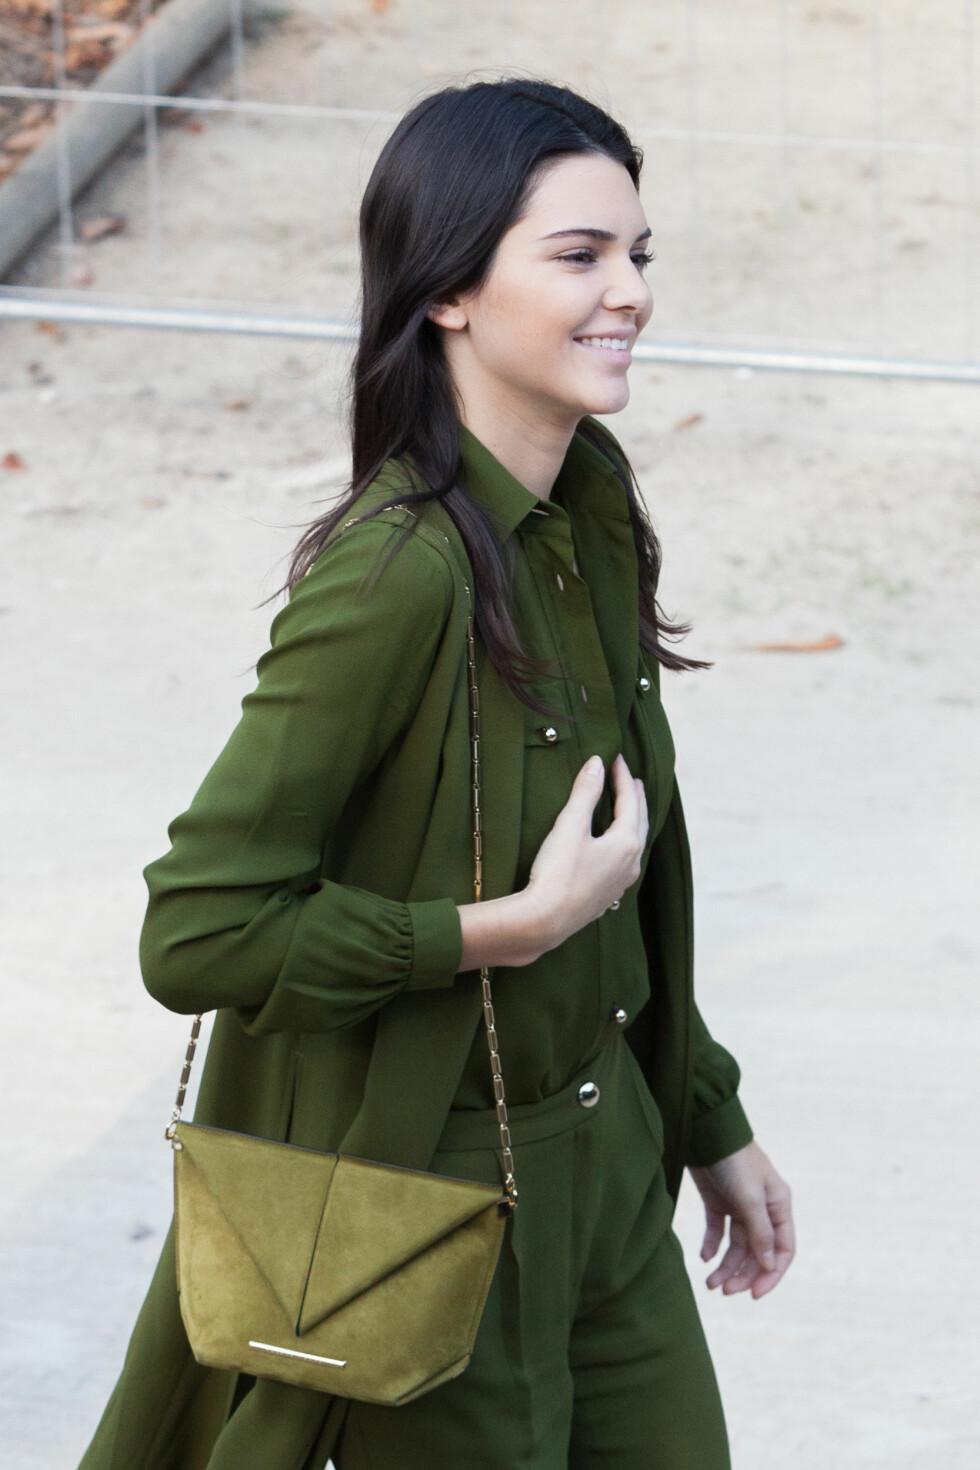 Kendall Jenner (19) Foto: Abaca